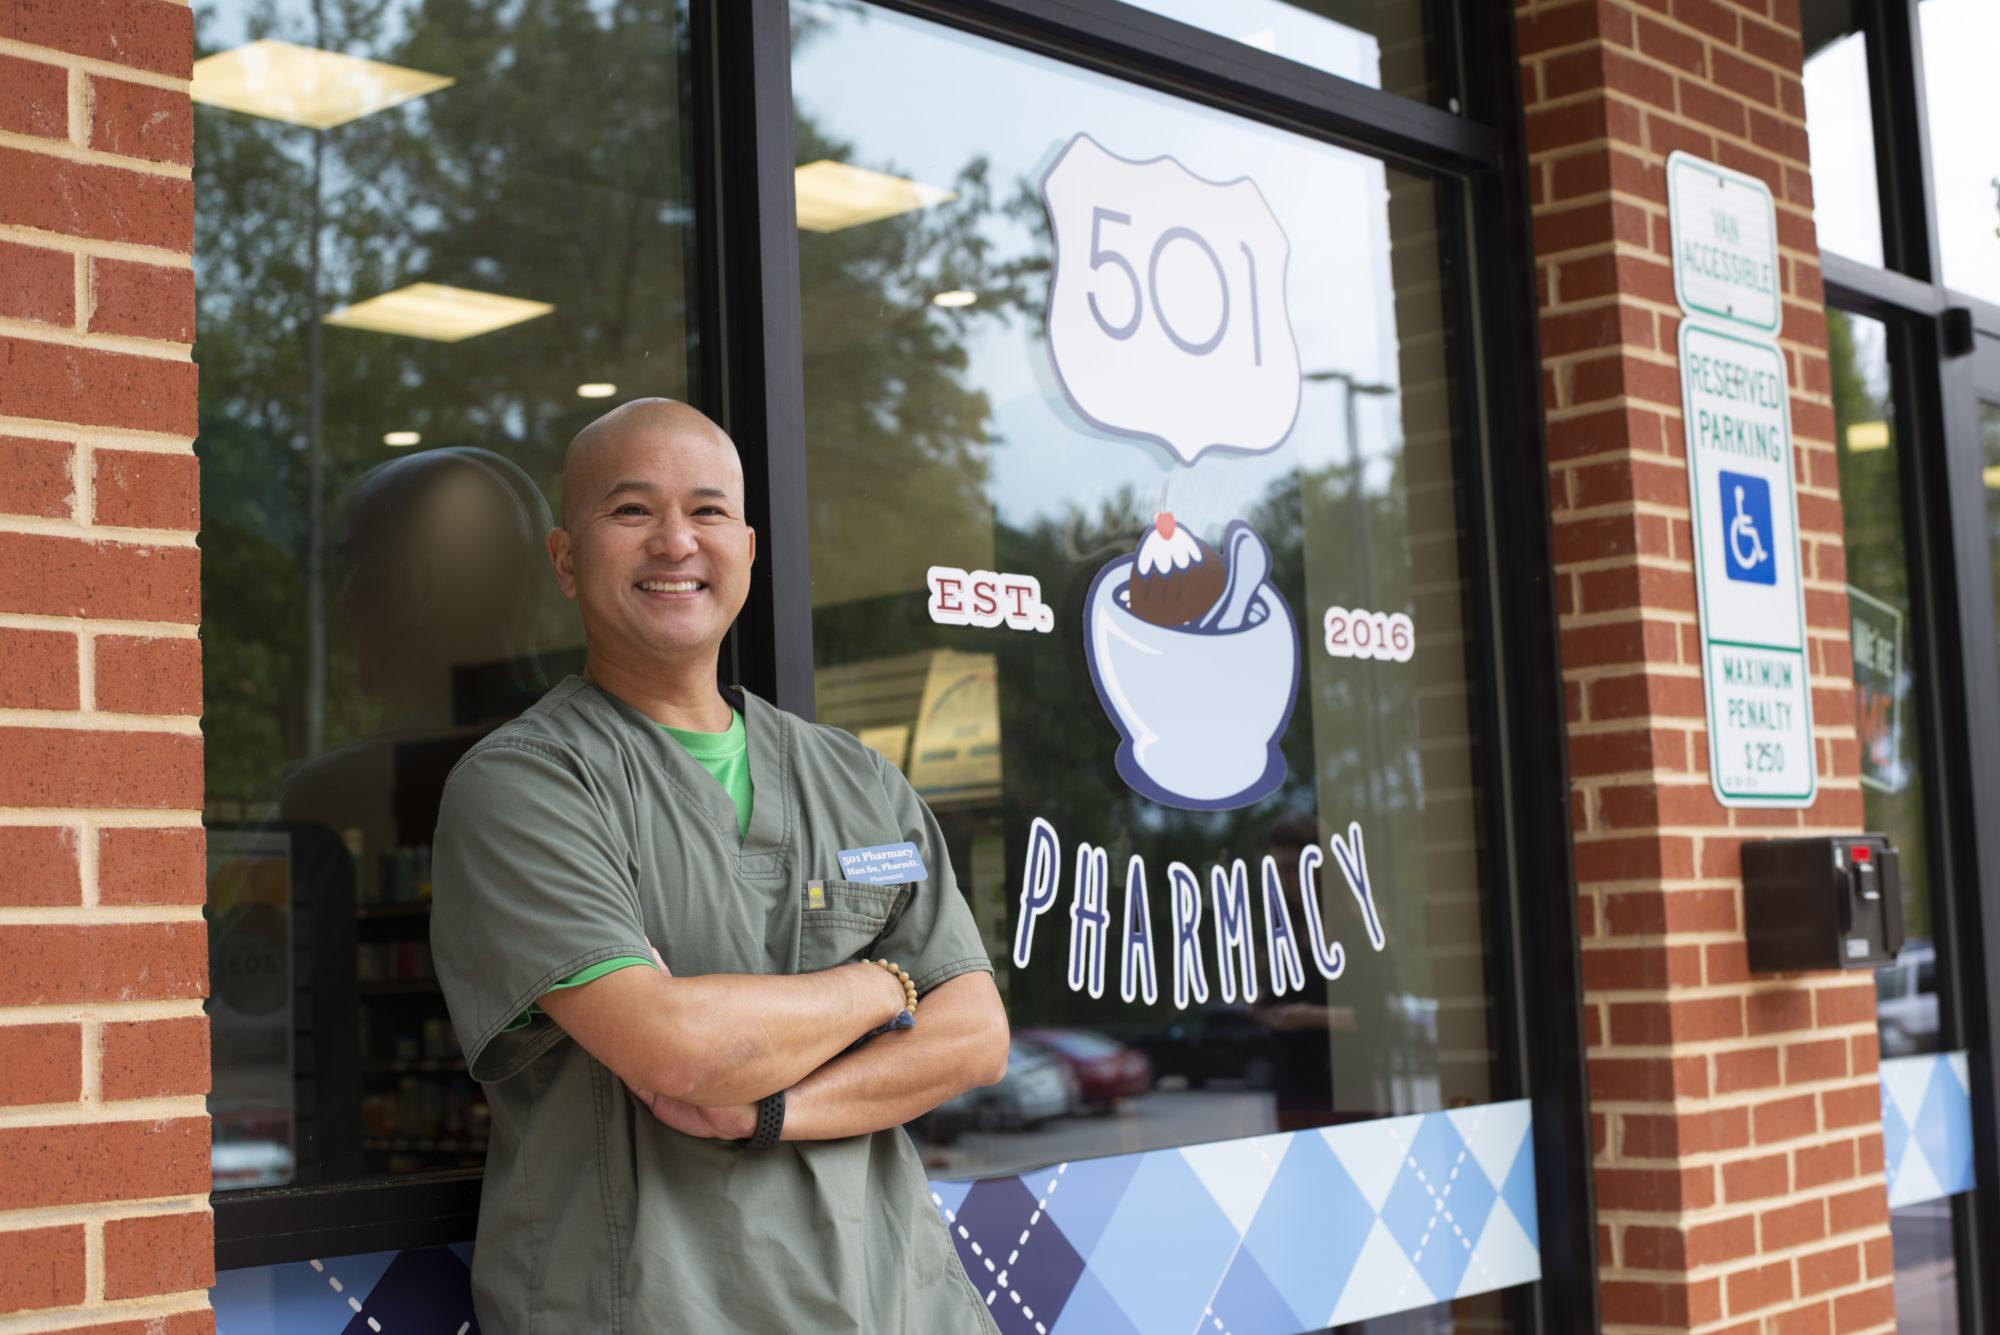 Han Su, Pharmacist, 501 Pharmacy in Chapel Hill, NC